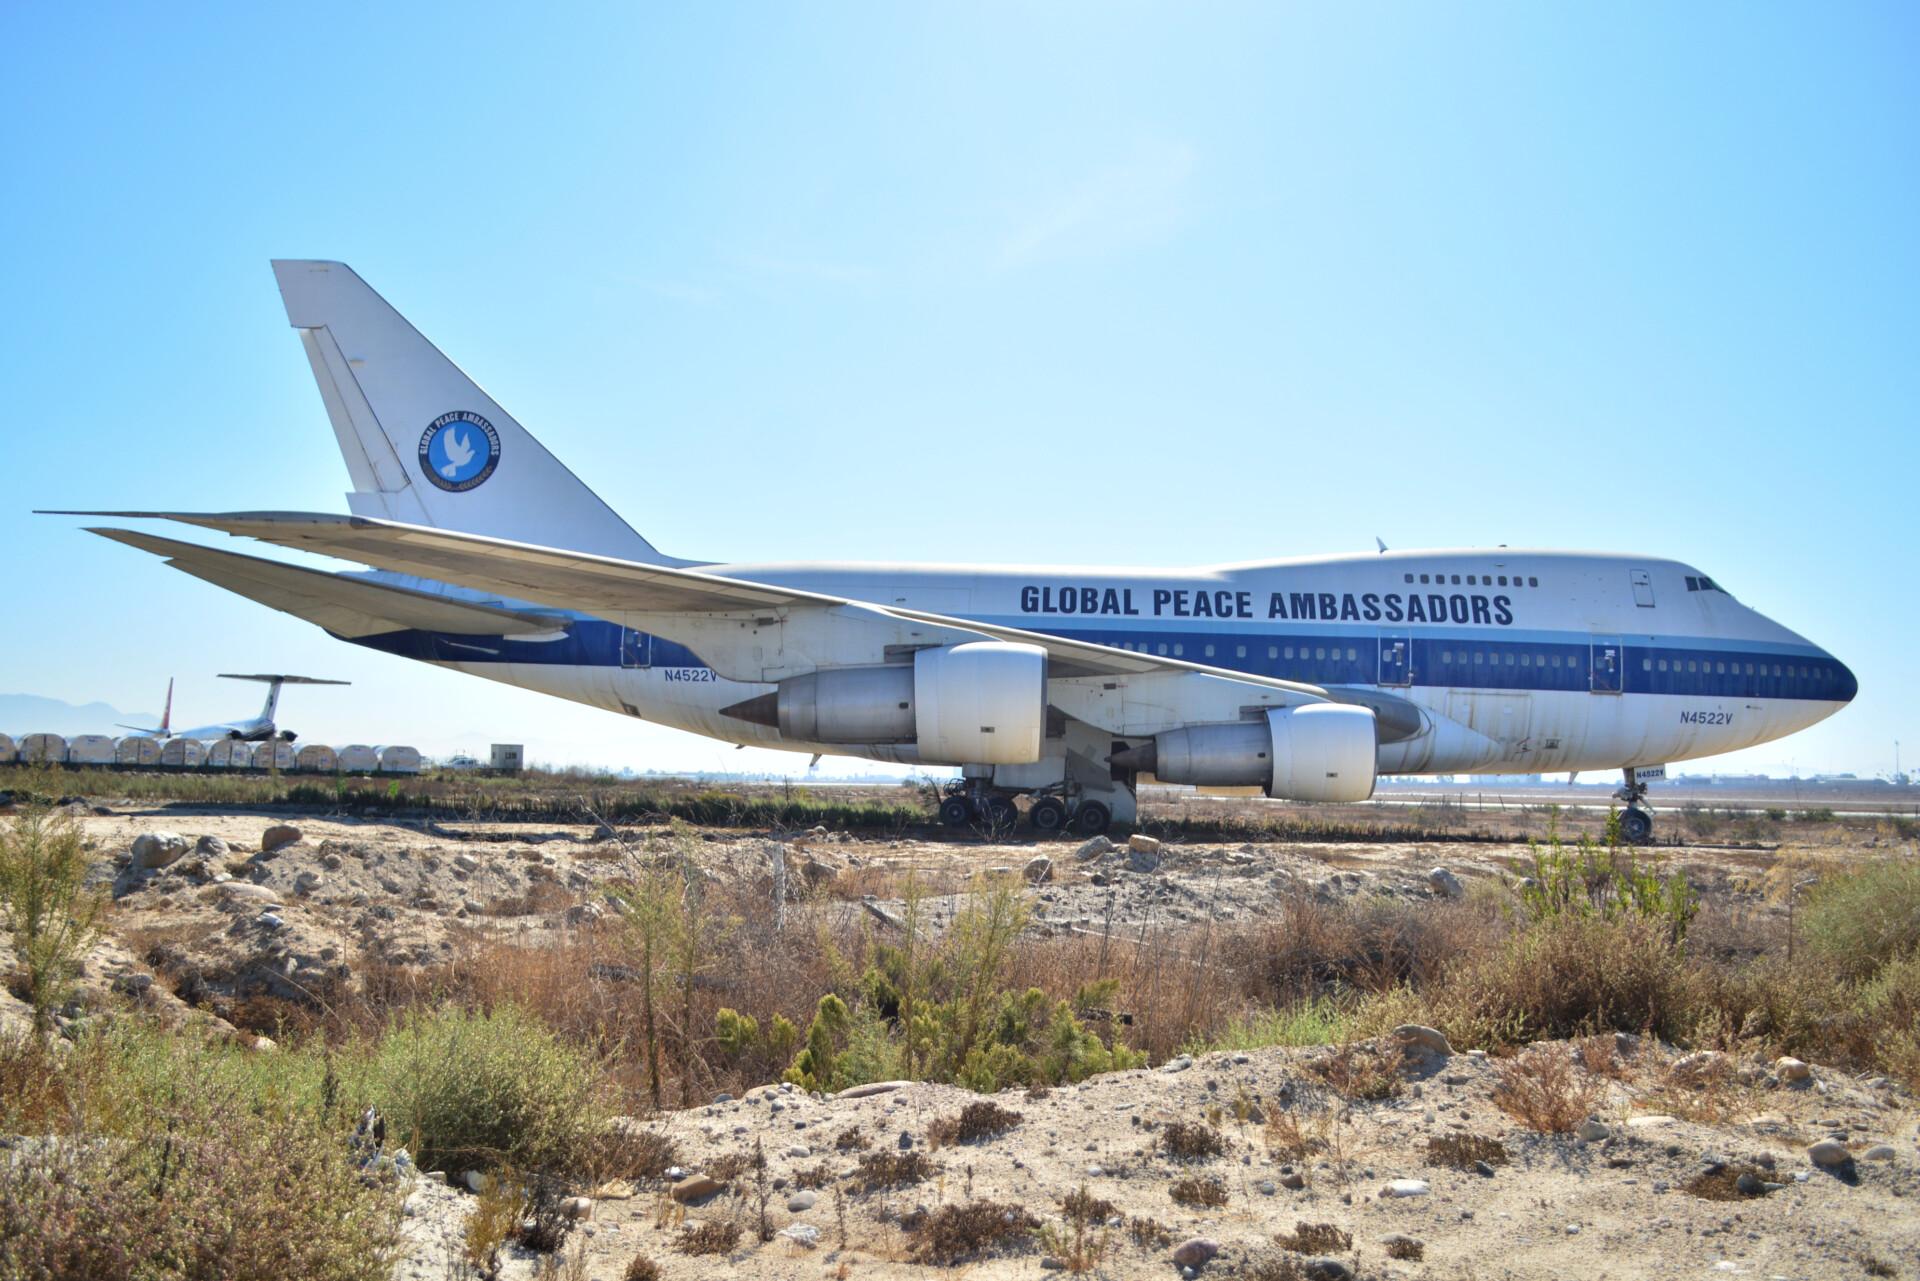 Global Peace Ambassadors 747 TIJ